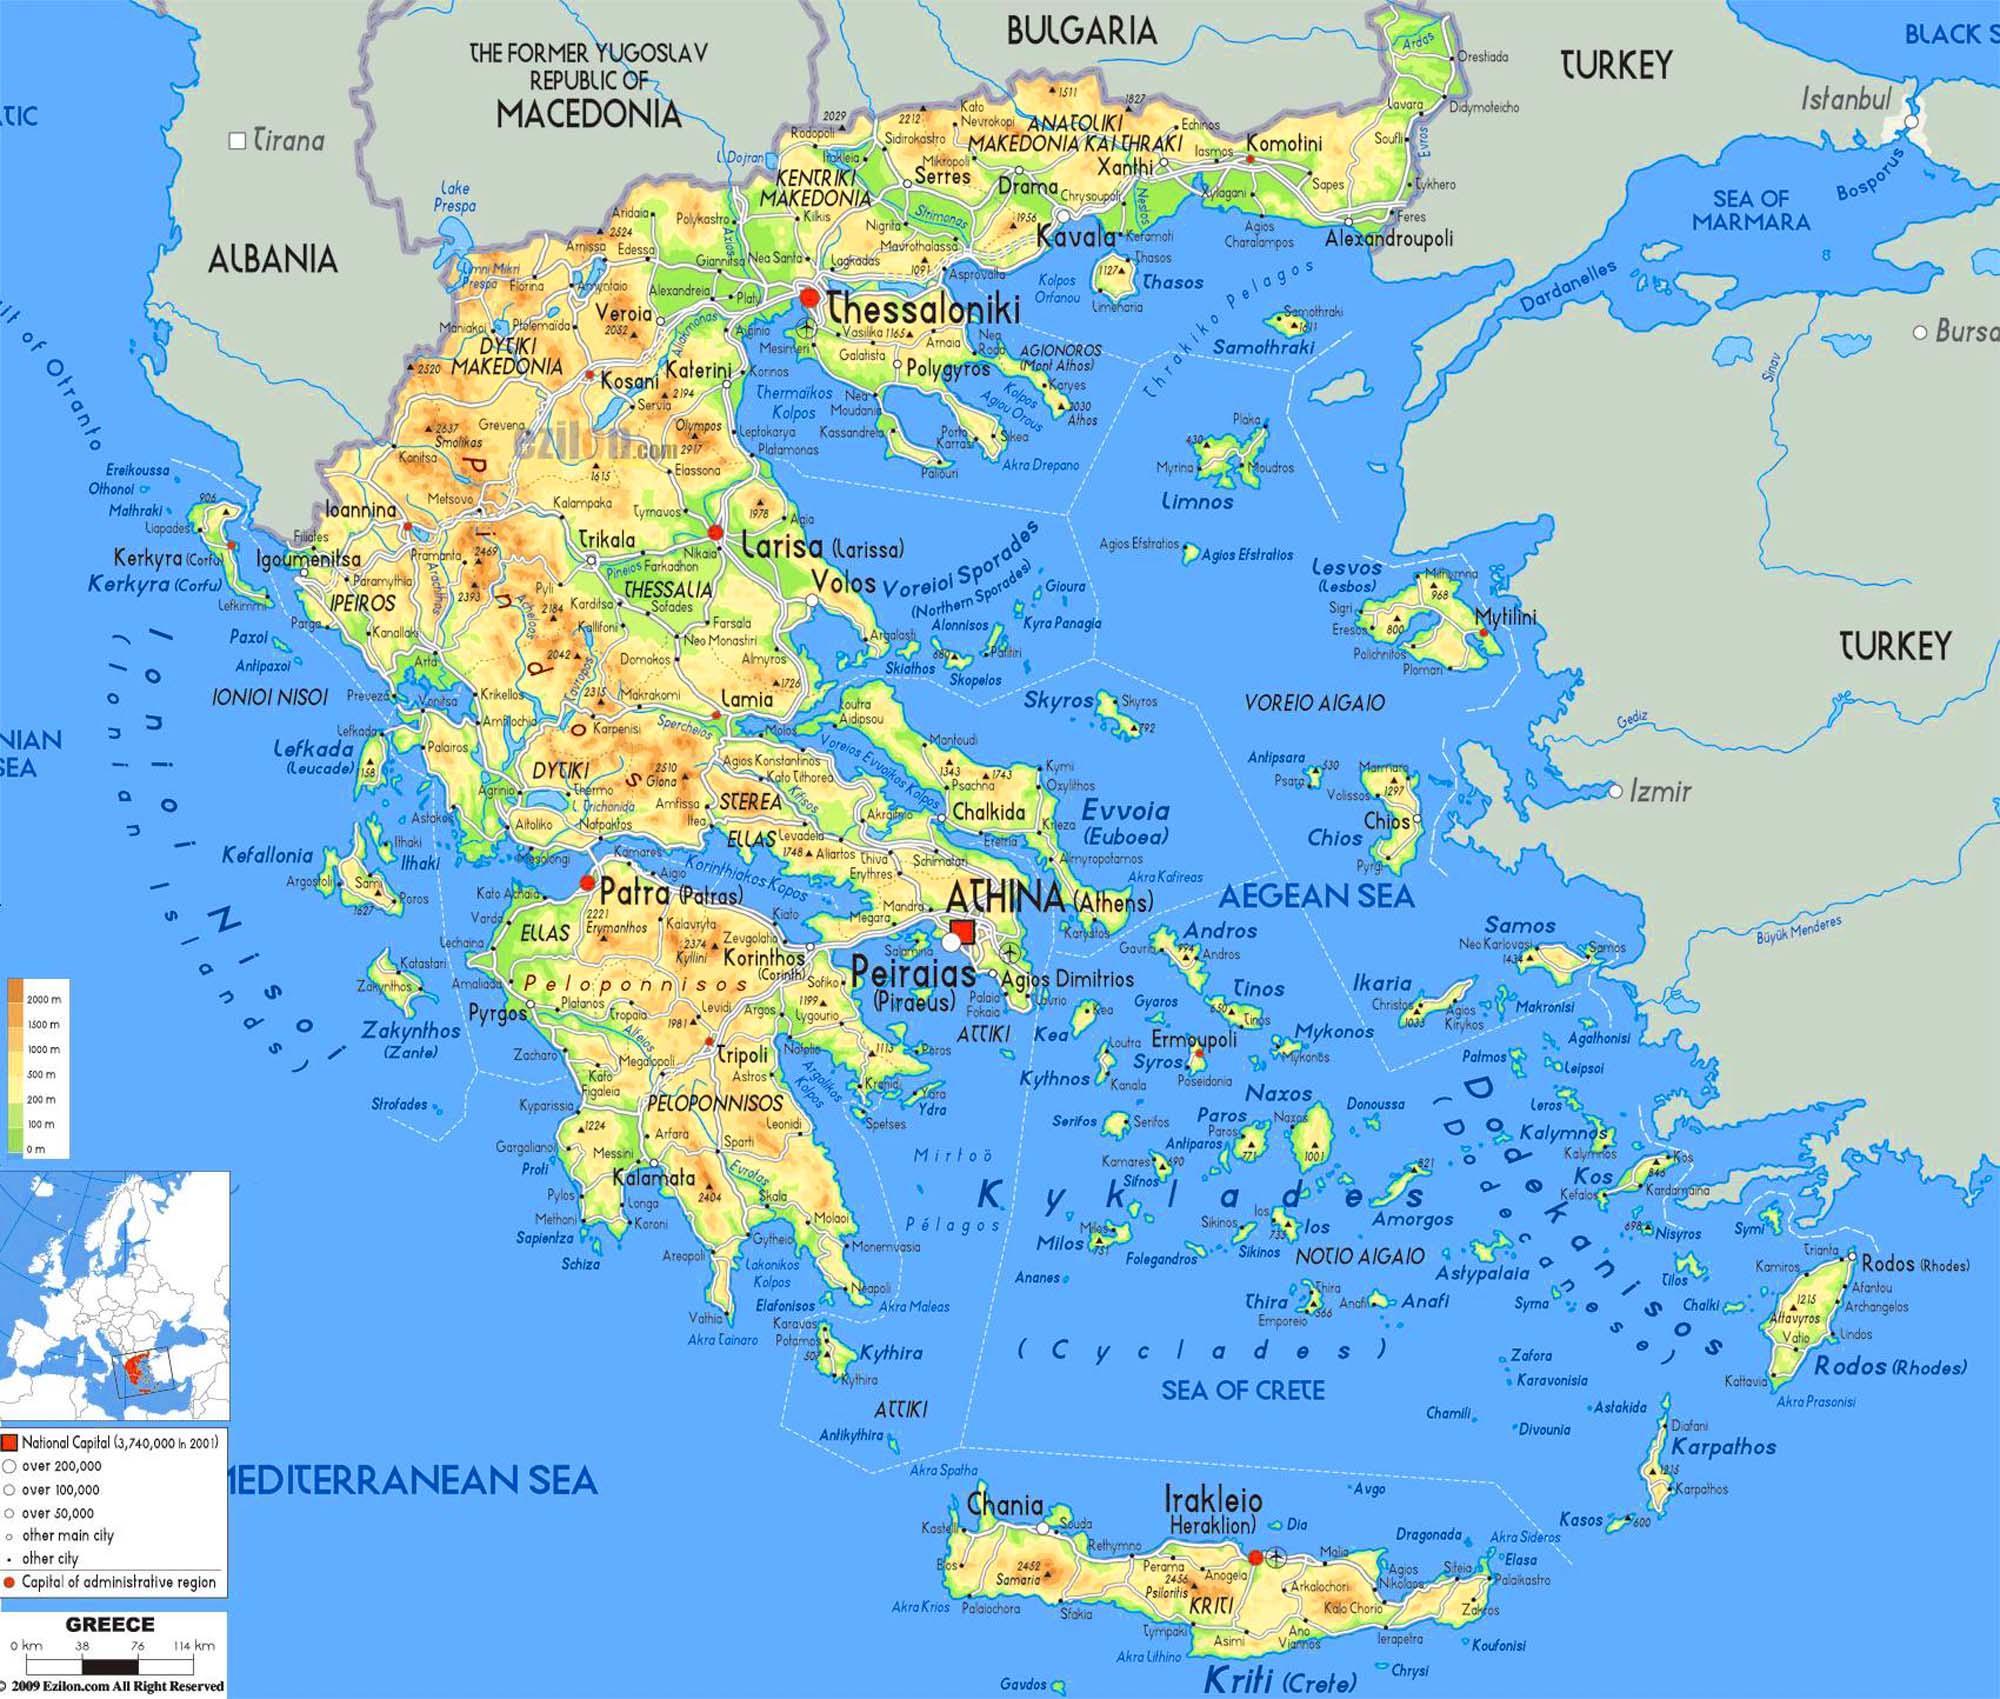 Mapa Reckych Ostrovu Mapa Reckych Ostrovu Jizni Evropa Evropa